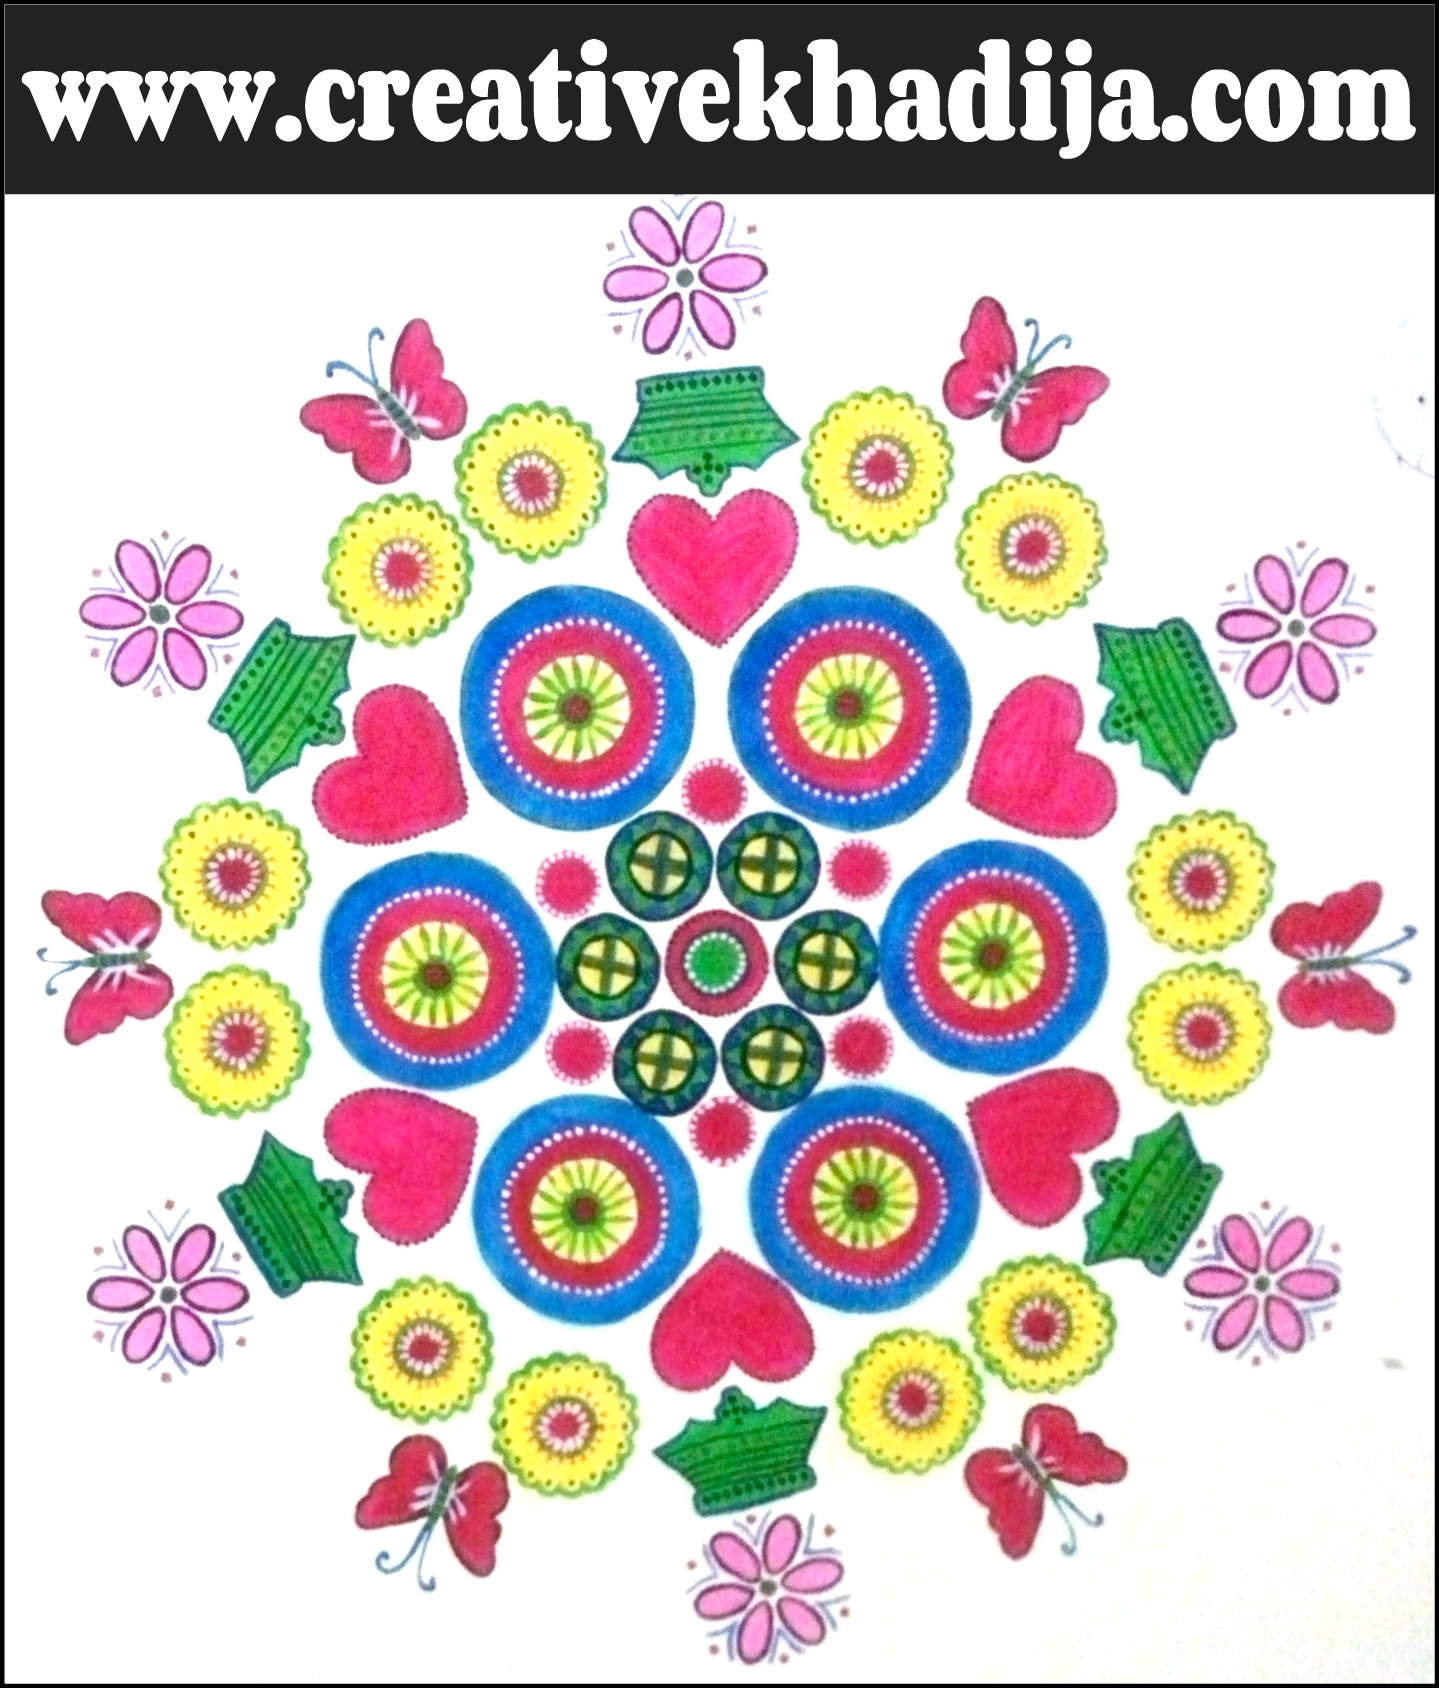 Creativekhadija watermark